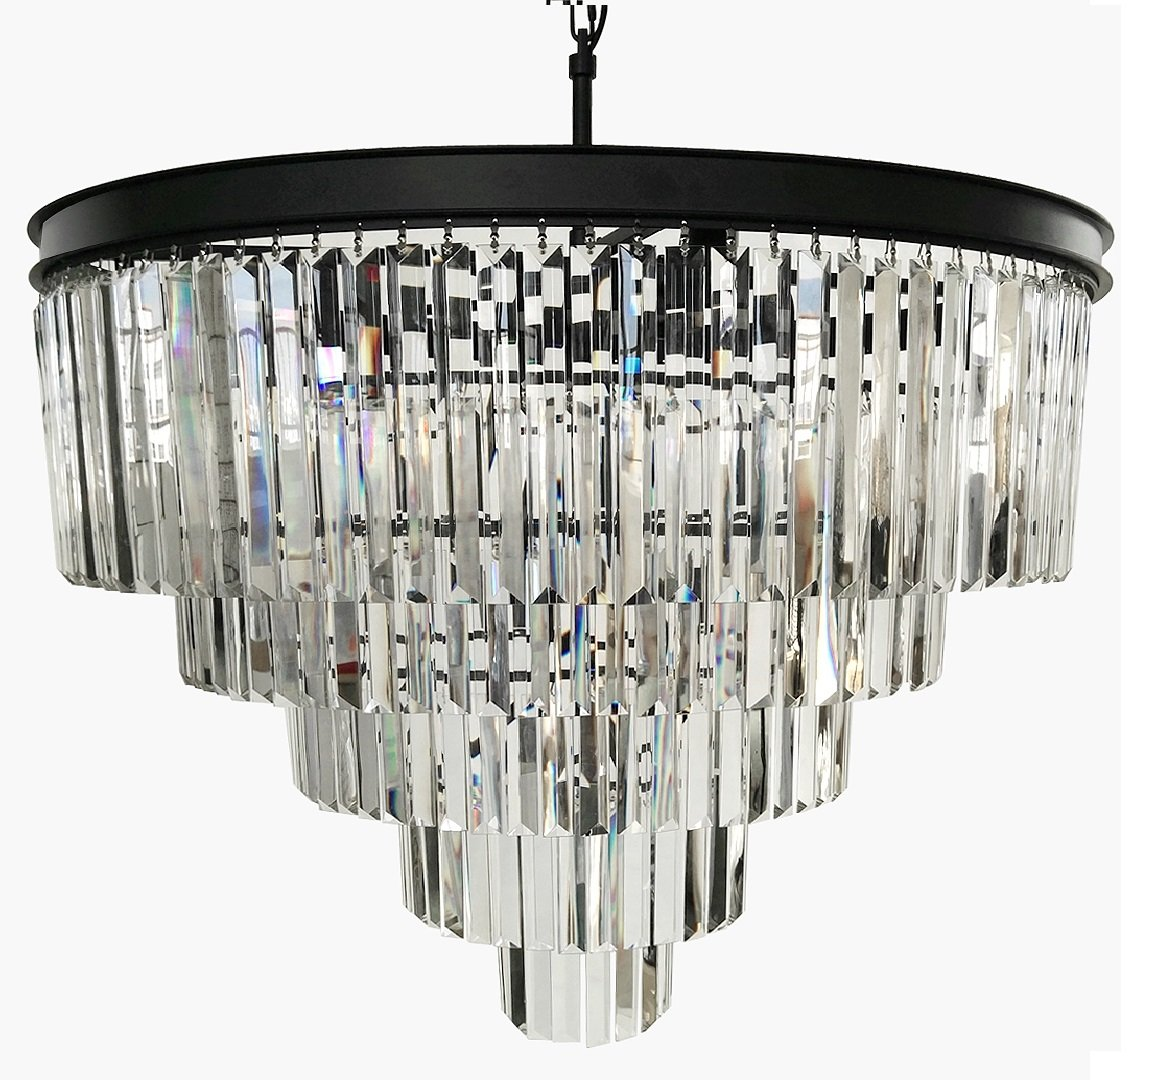 Zgear 12 Lights Luxury Modern Crystal Chandelier Pendant Ceiling Light For Dining Room Living Com